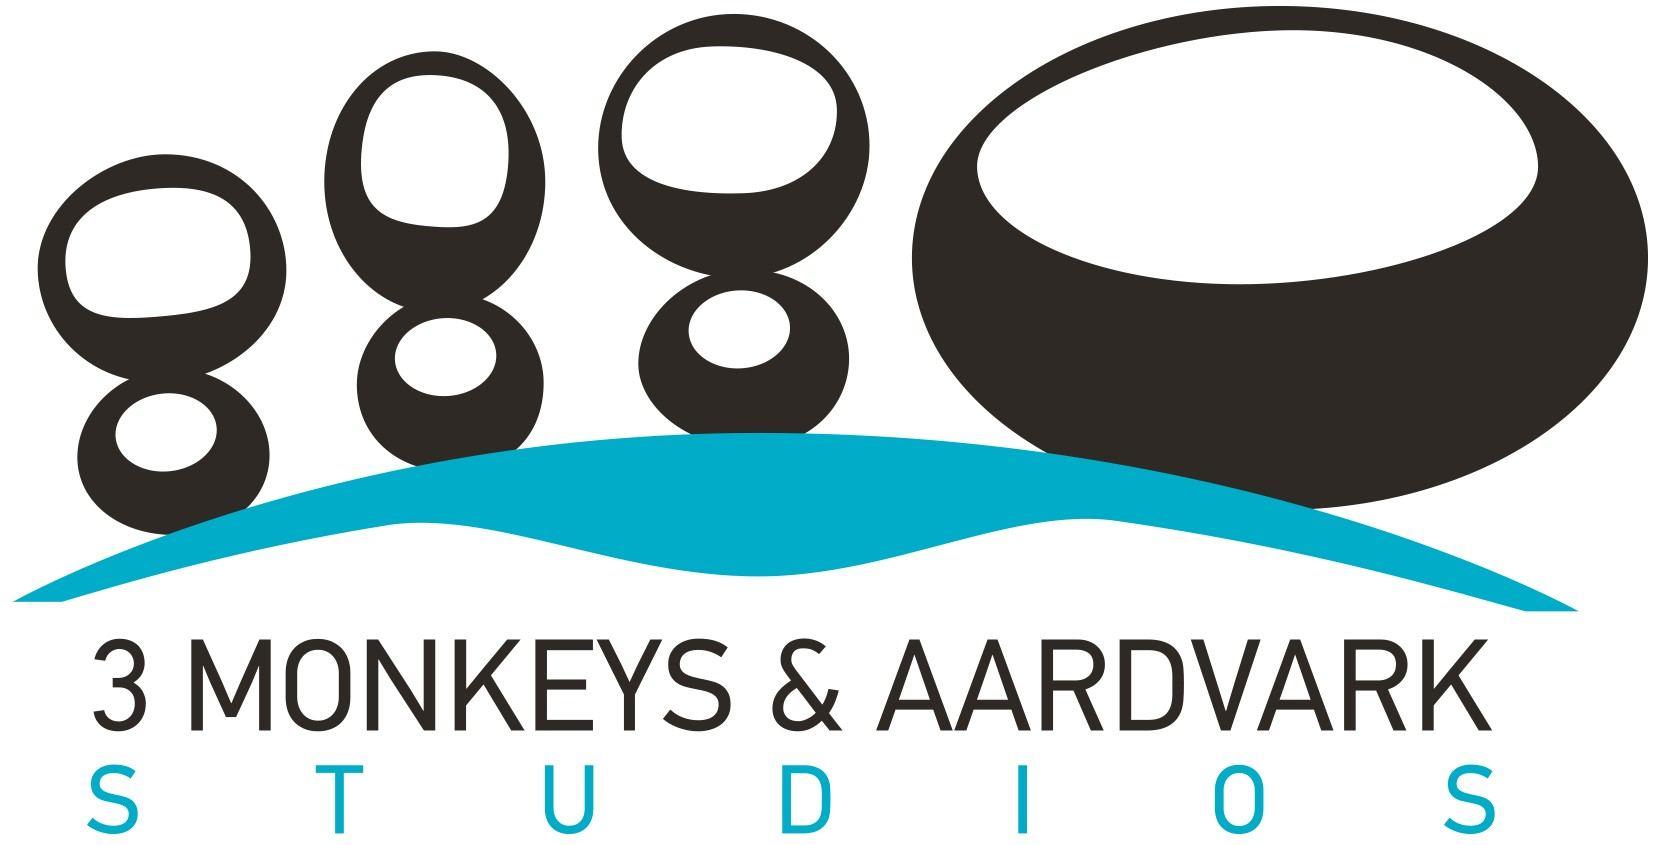 3 Monkeys & Aardvark Studios Logo